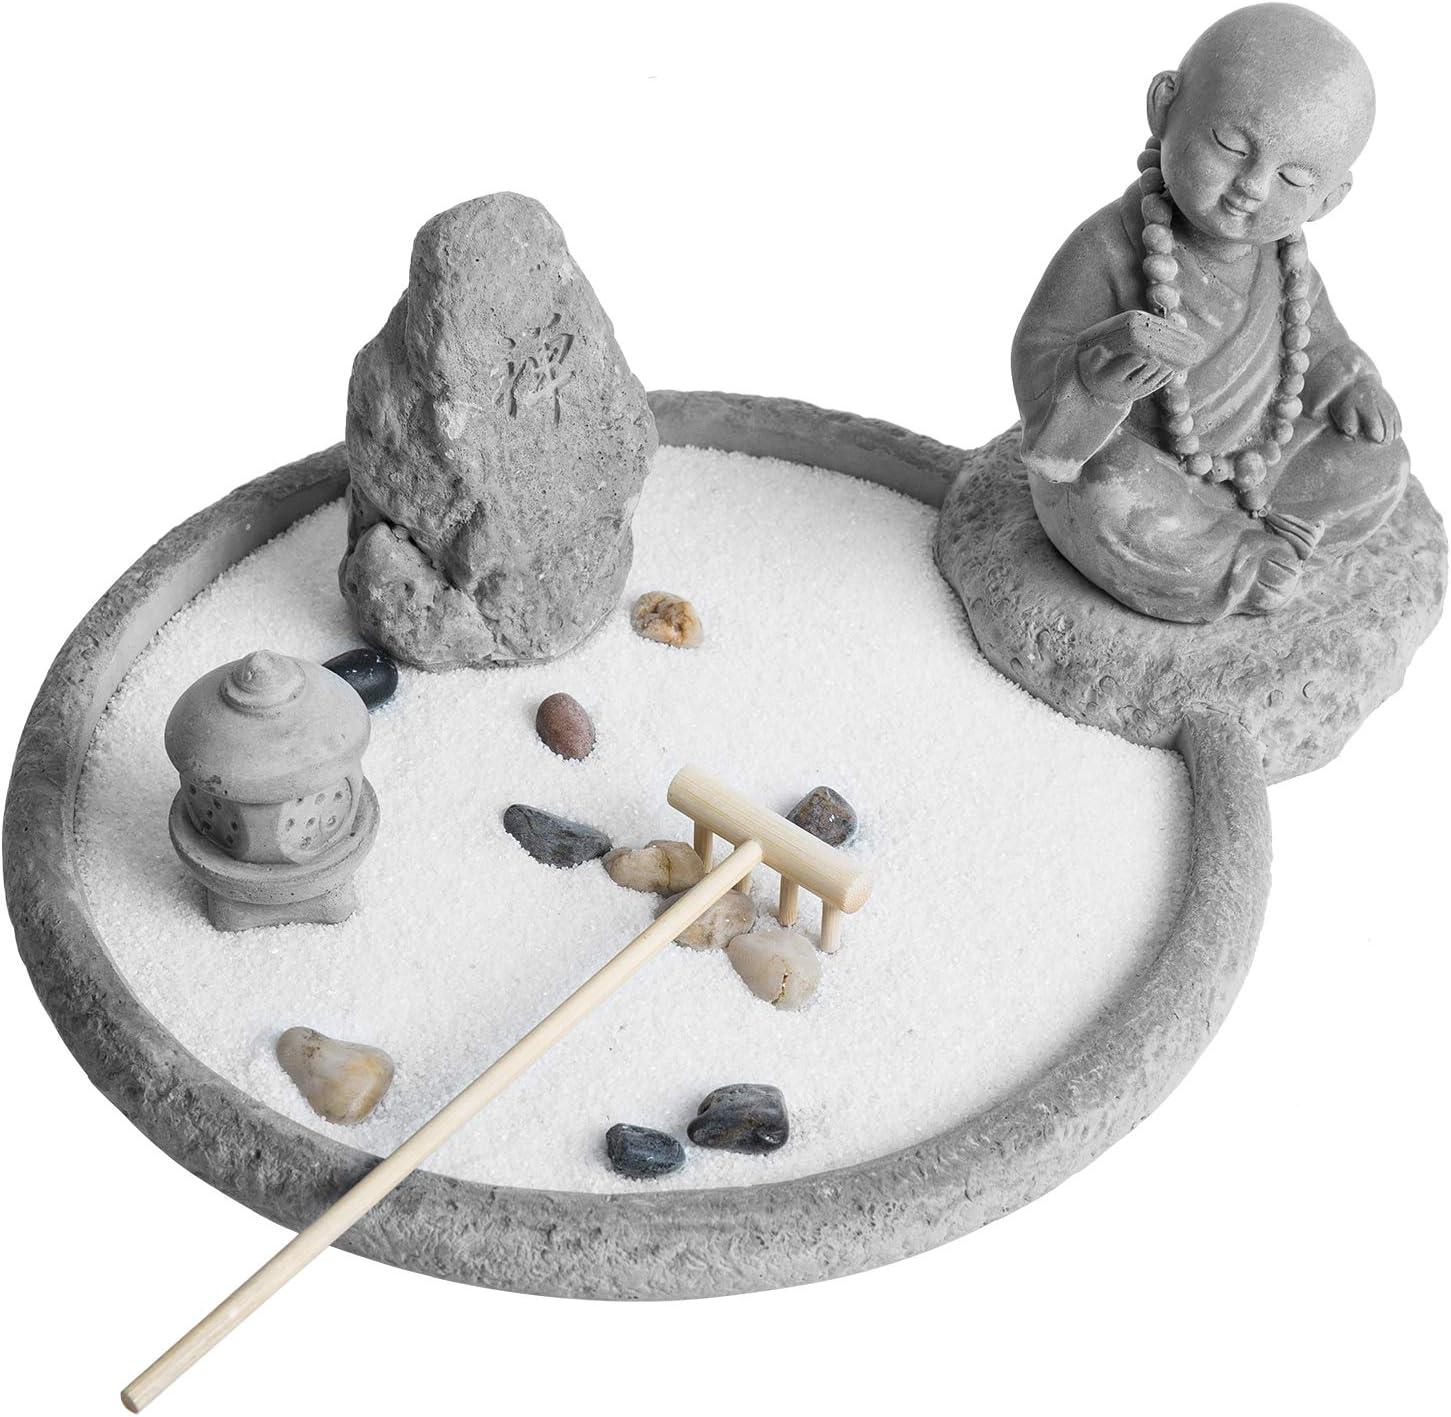 MyGift Japanese Desktop Rustic Cement Buddha Monk Statue Zen Garden Kit with Sand, Rocks & Rake